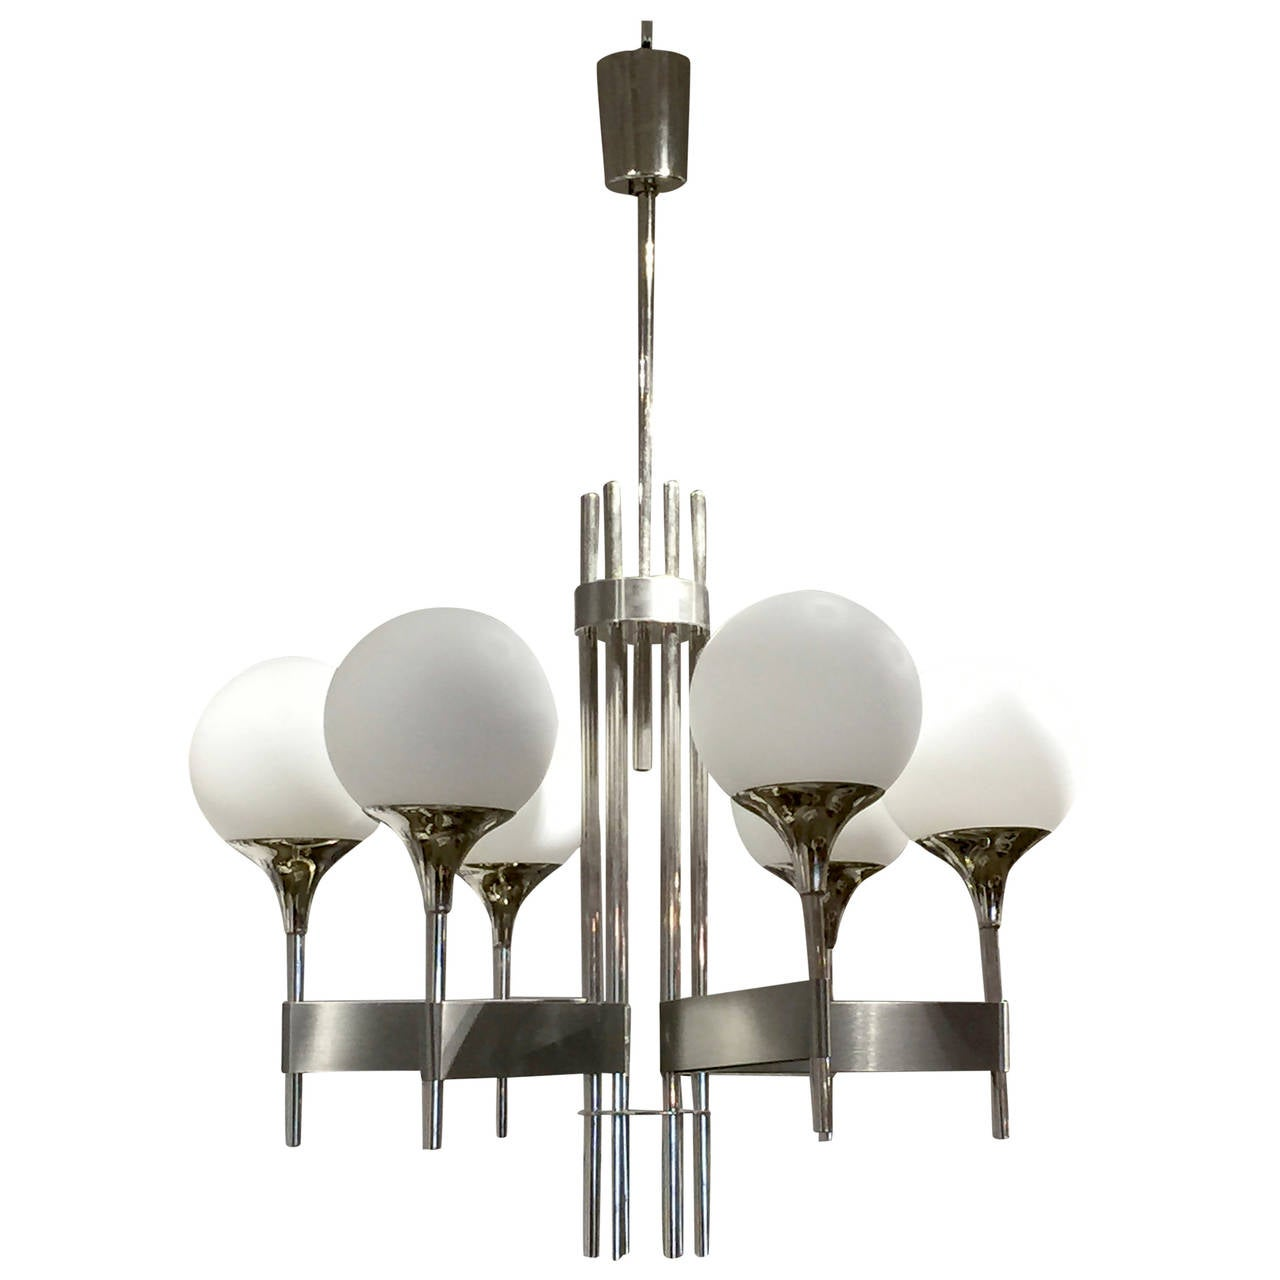 Elegant stainless steel chandelier sciolari italy 1970s at 1stdibs elegant stainless steel chandelier sciolari italy 1970s for sale aloadofball Images